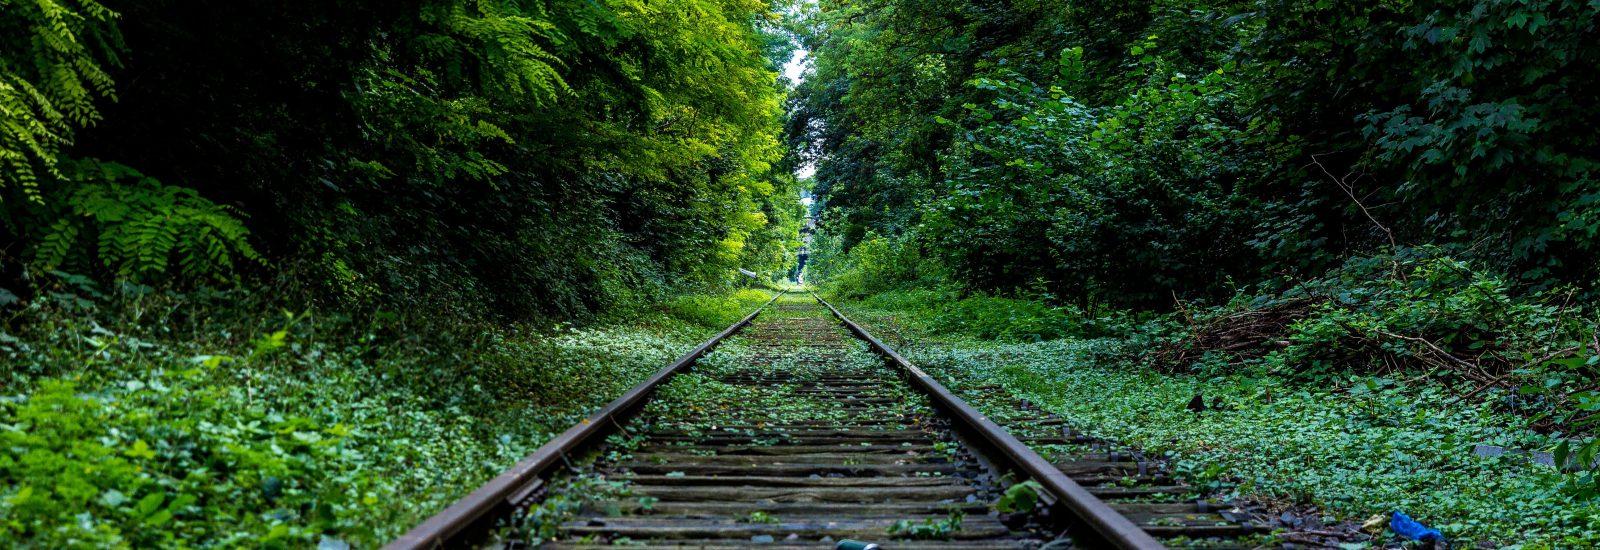 eisenbahn-fahrte-gerade-34950